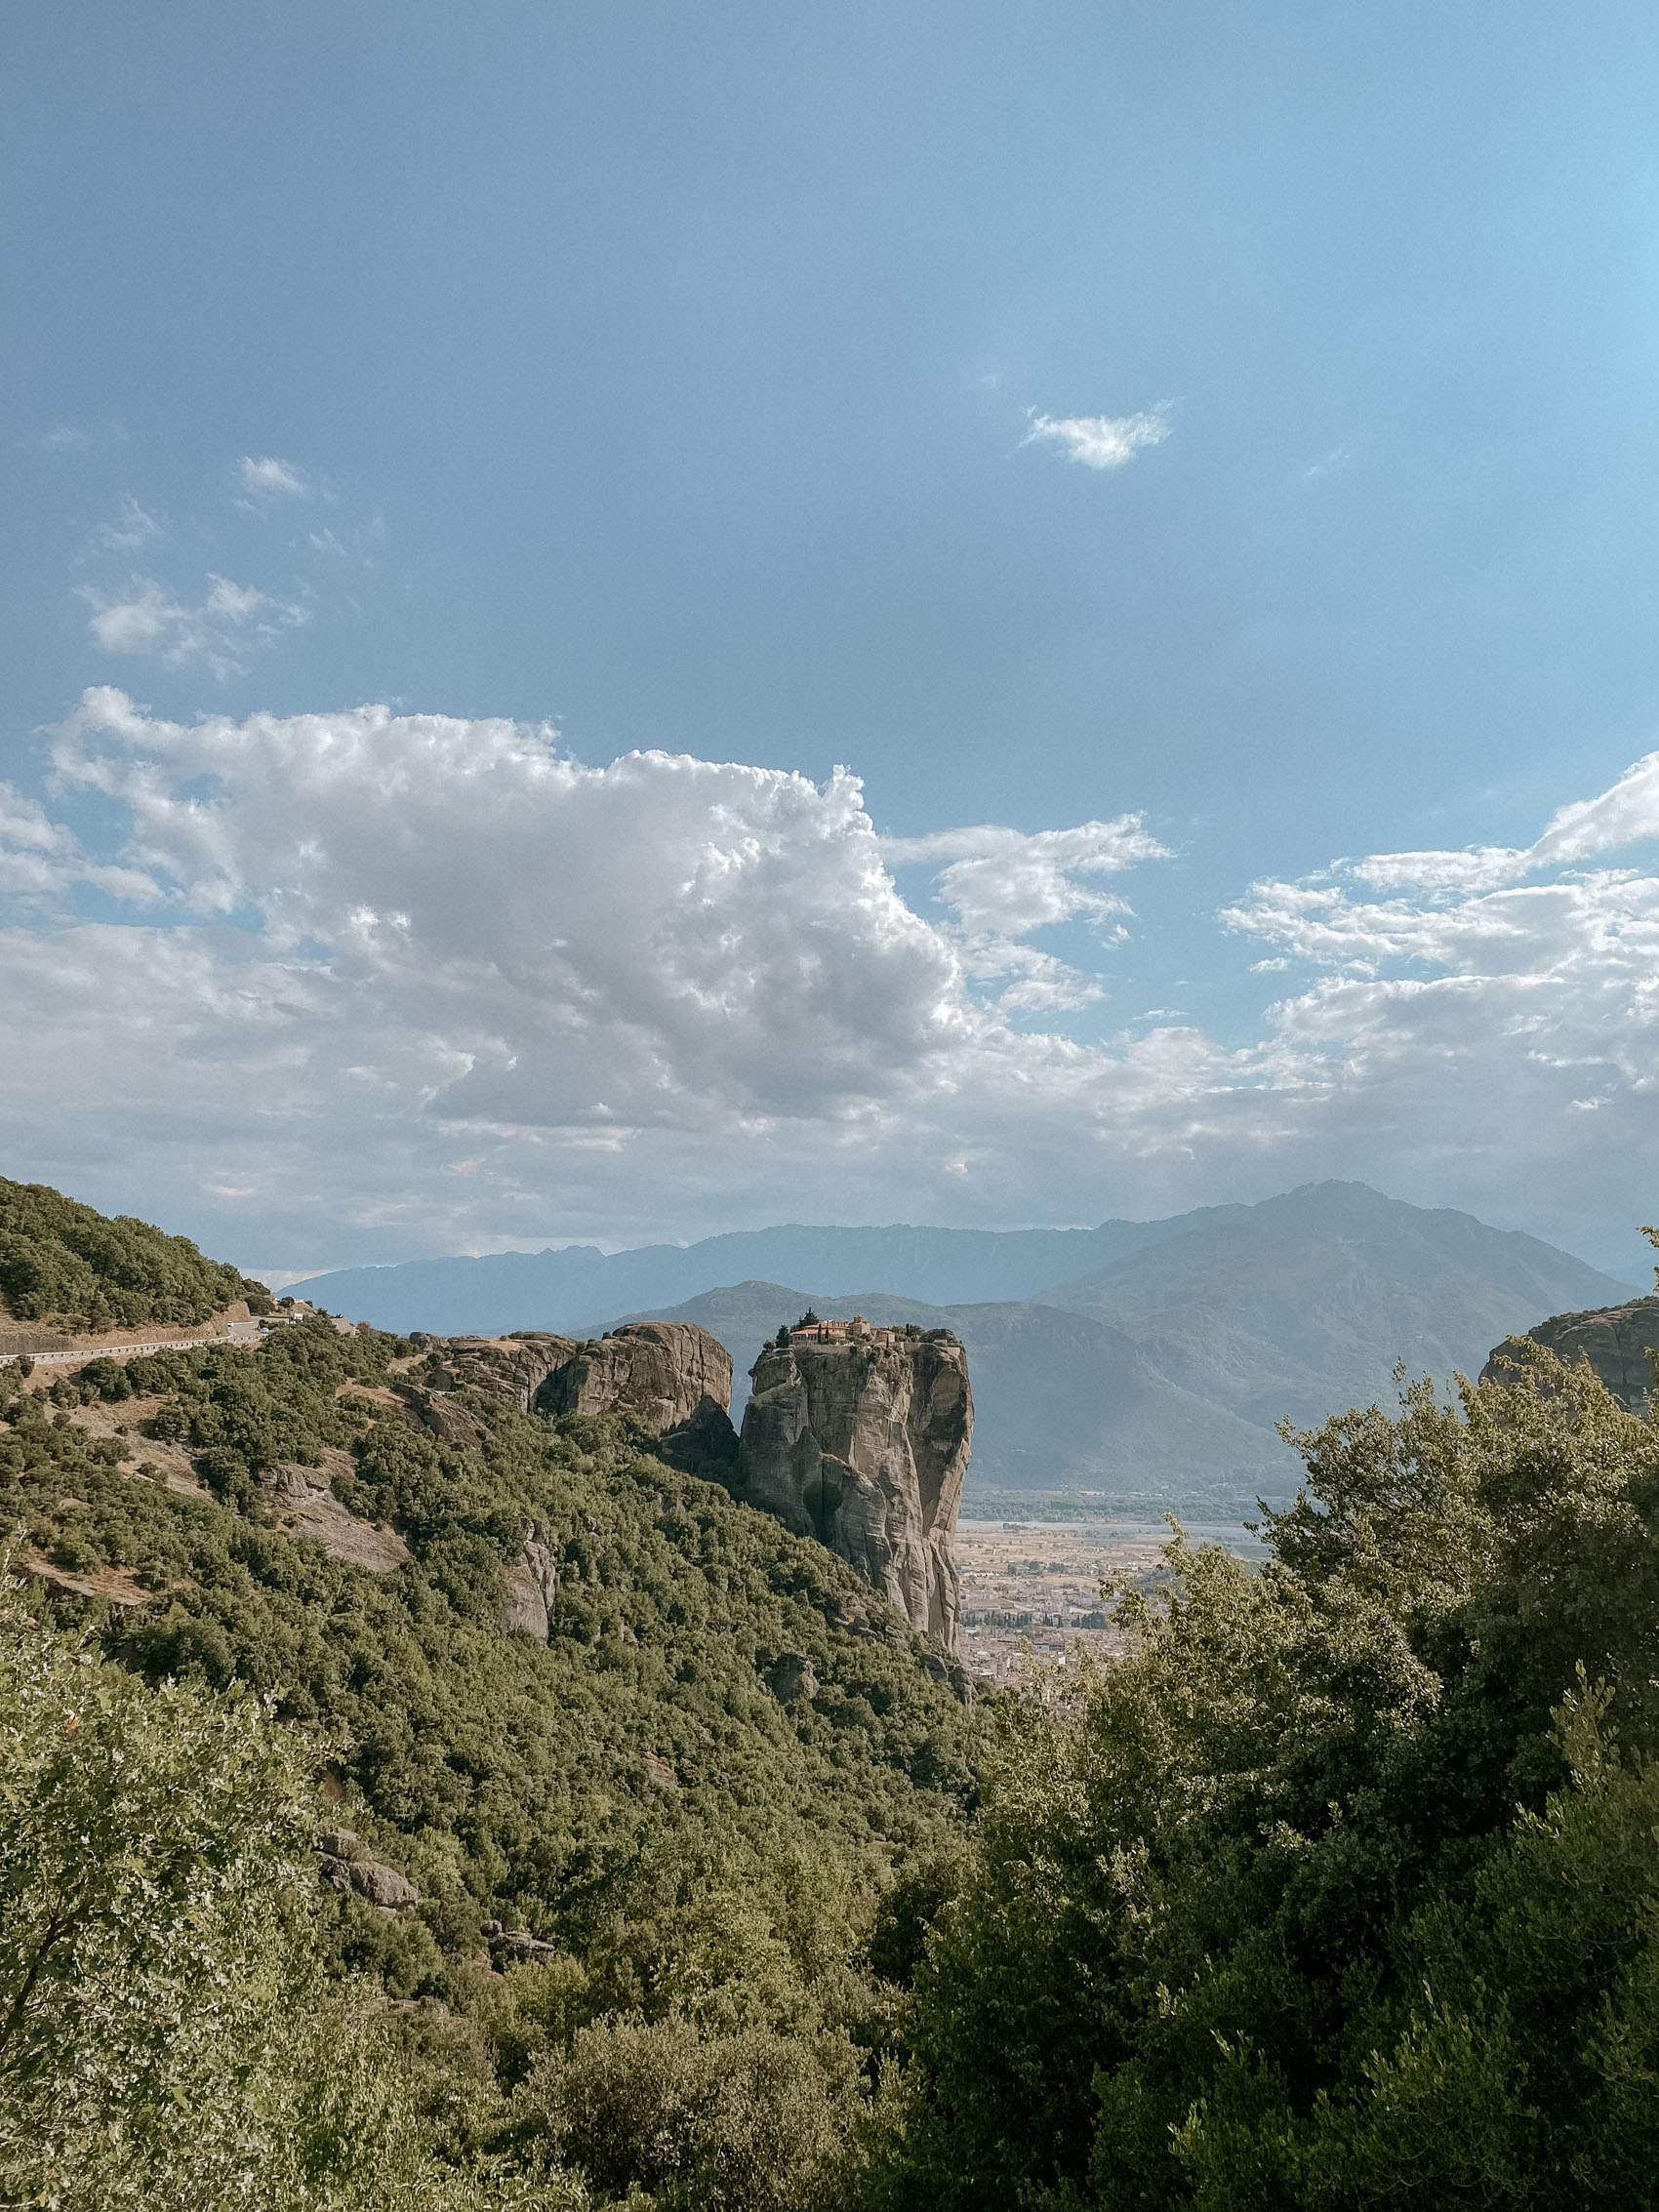 Visiting the Meteora Monasteries the Holy Trinity Monastery